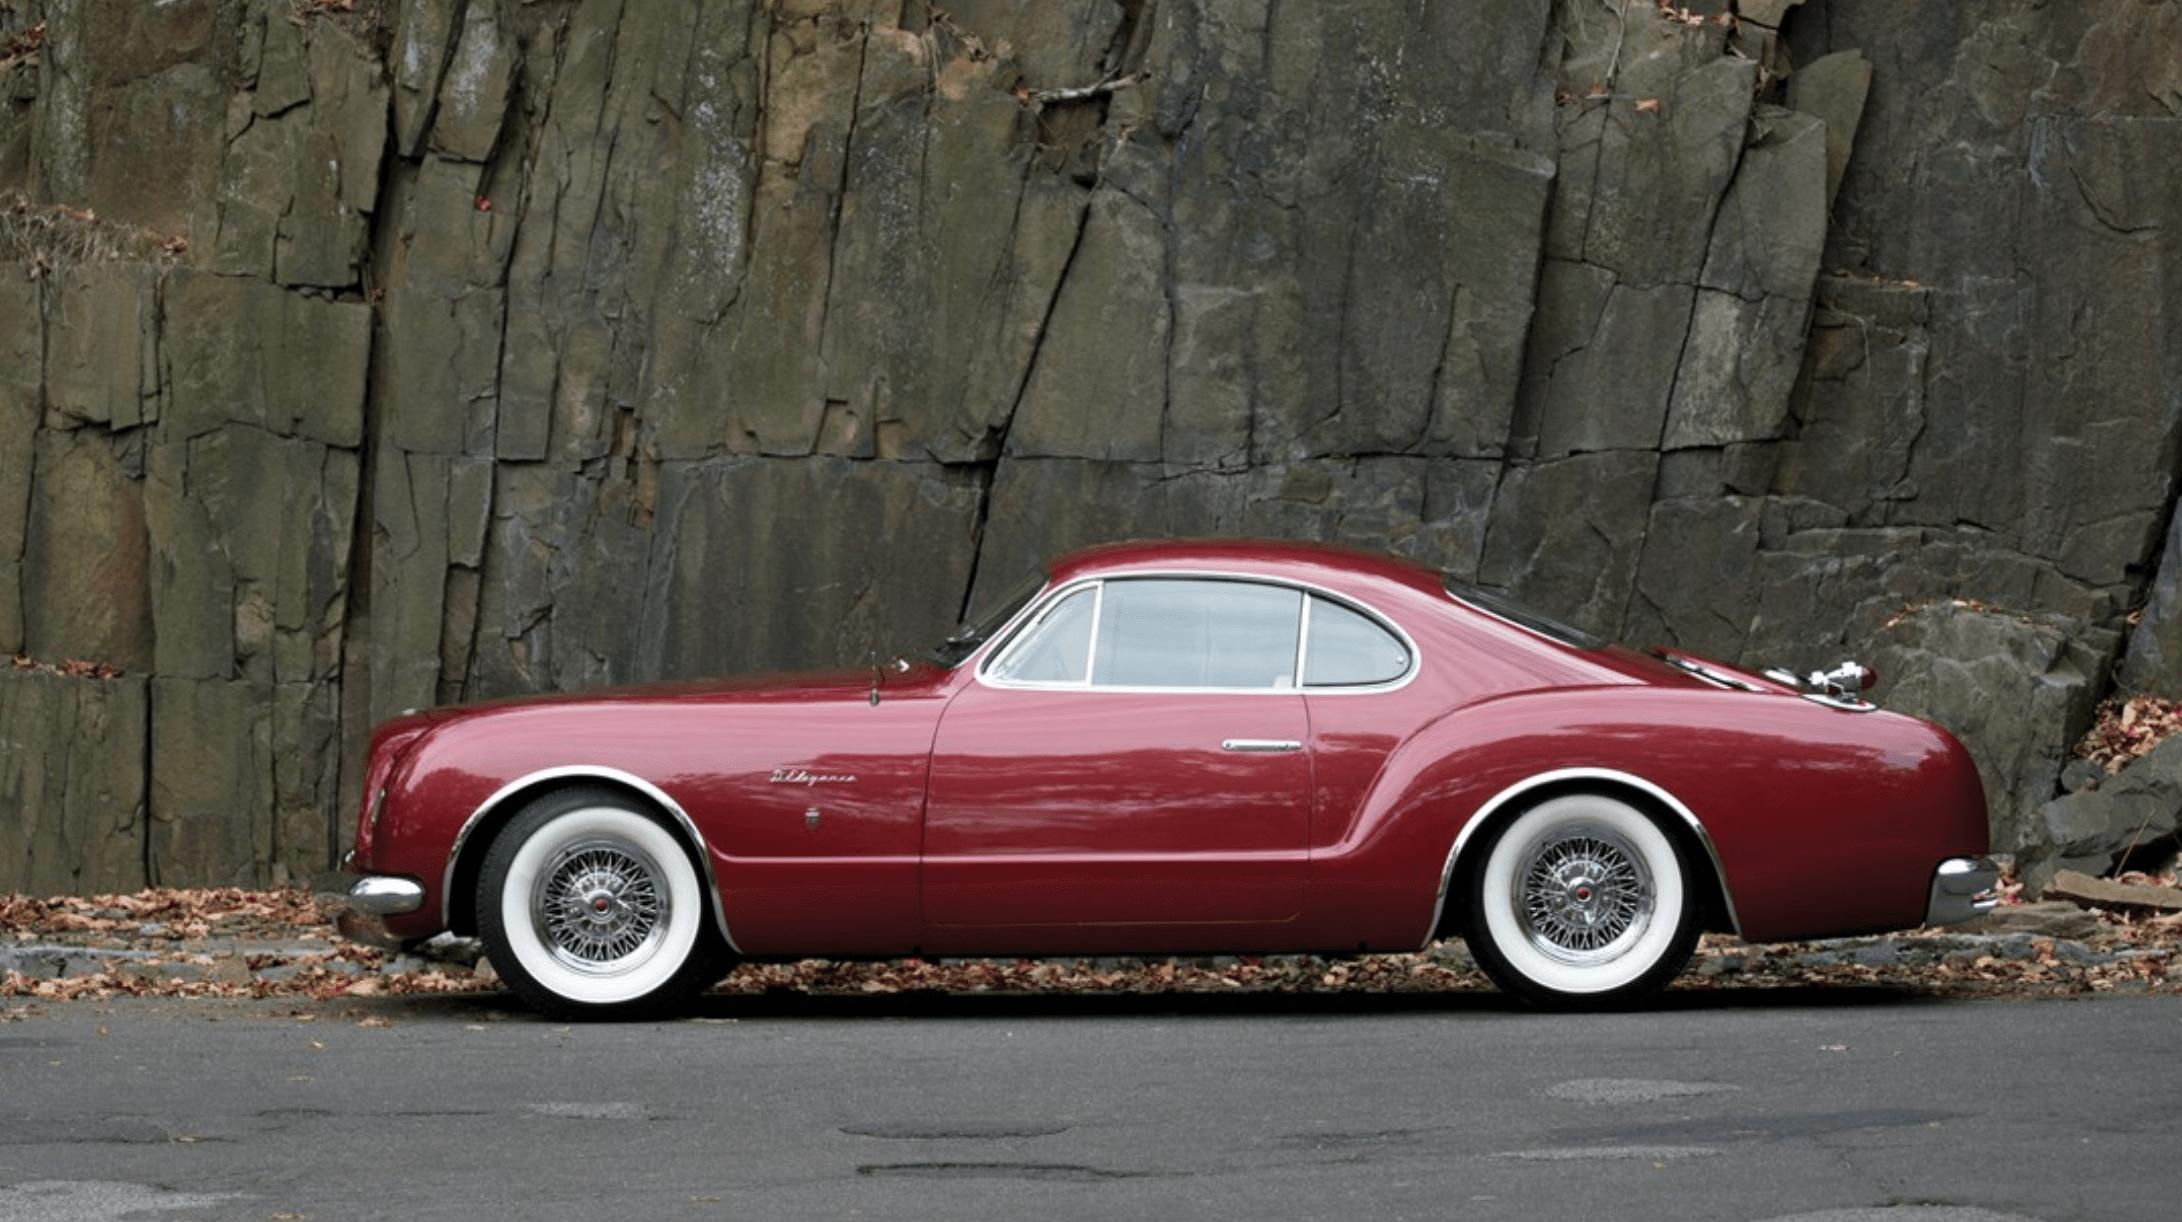 Leasing a Vintage Vehicle